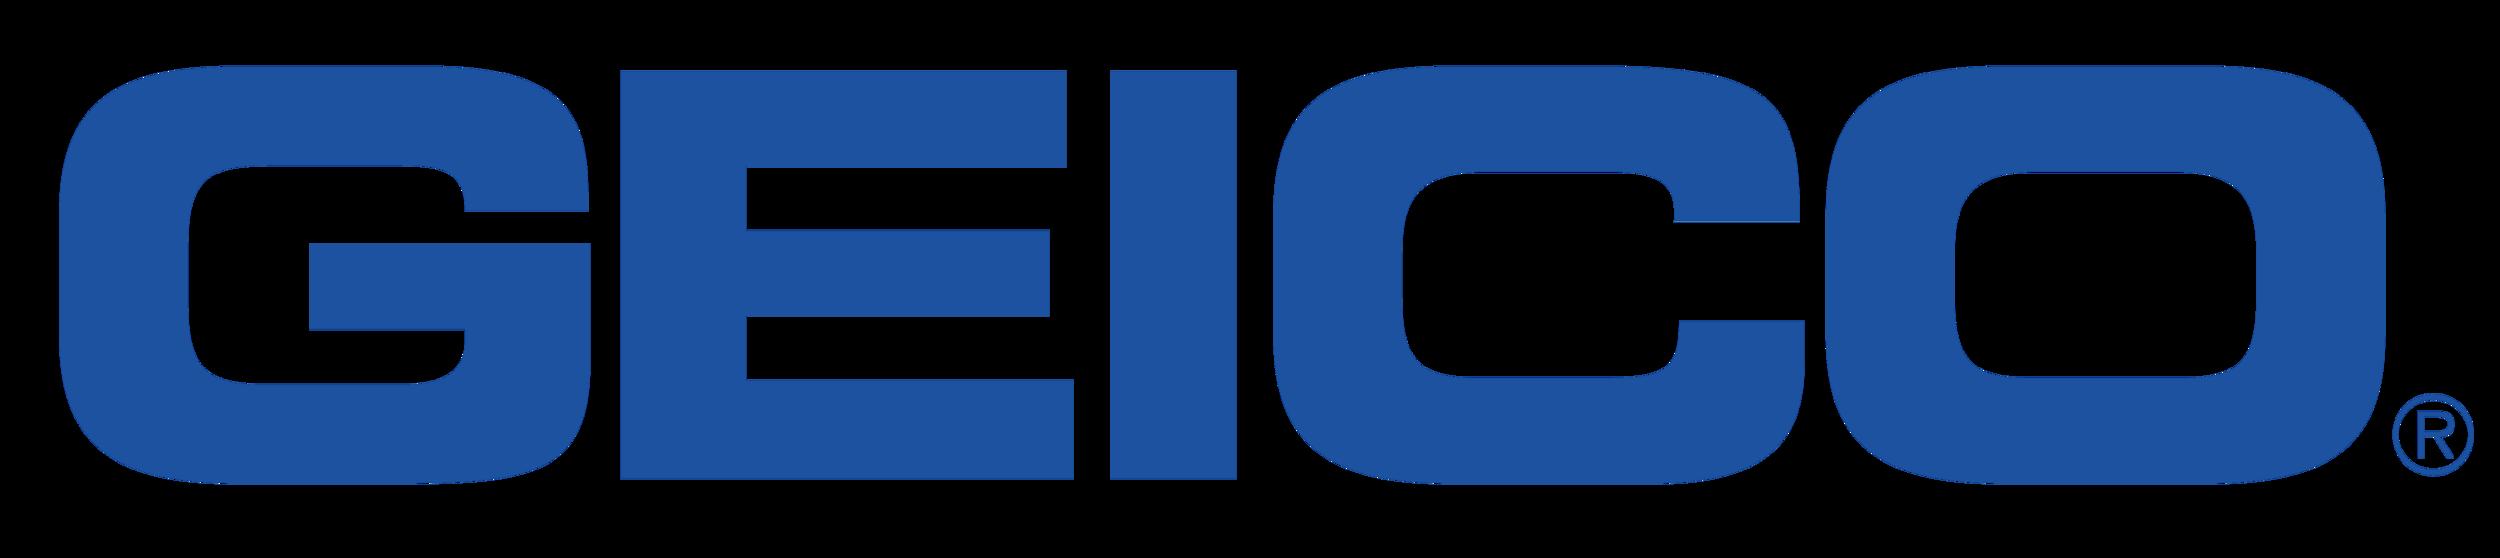 Geico_logo.png